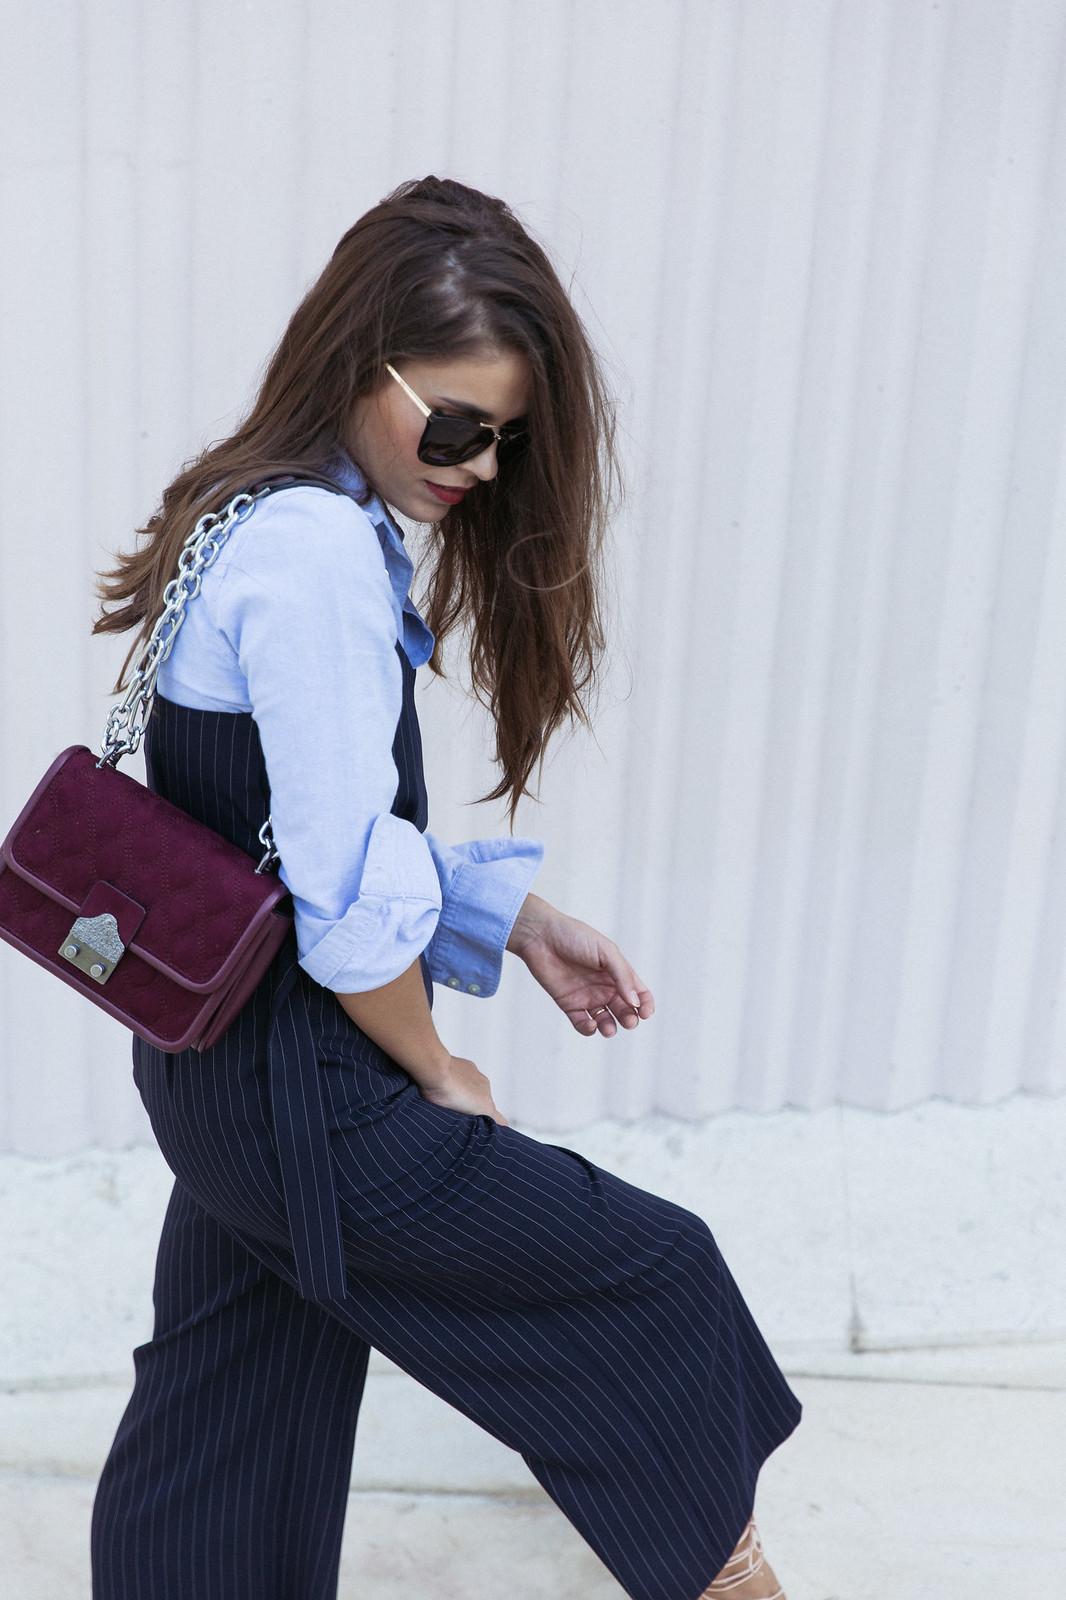 Jessie Chanes Seams for a desire - Pinstripped suit topshop heeled sandals schutz parfois bag  -15